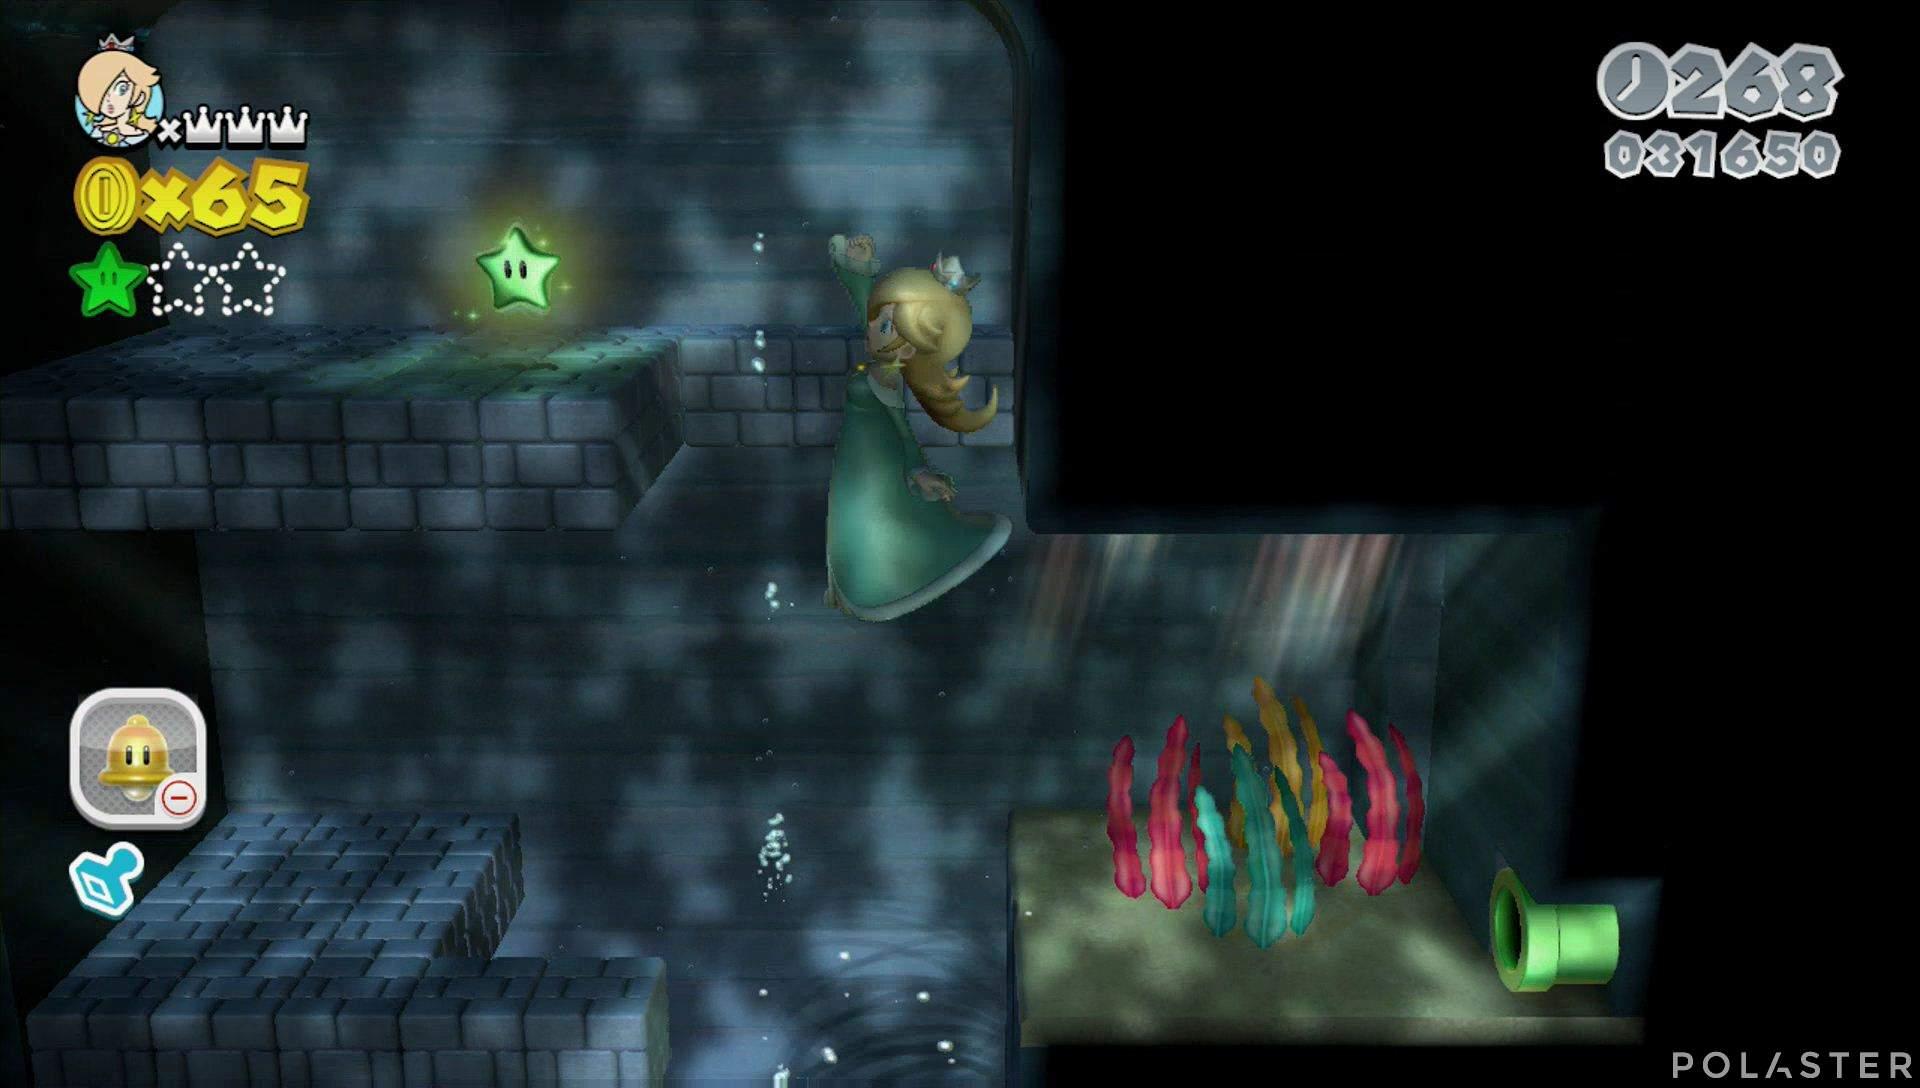 Super Mario 3D World Mundo Estrella-7 Estrella 2